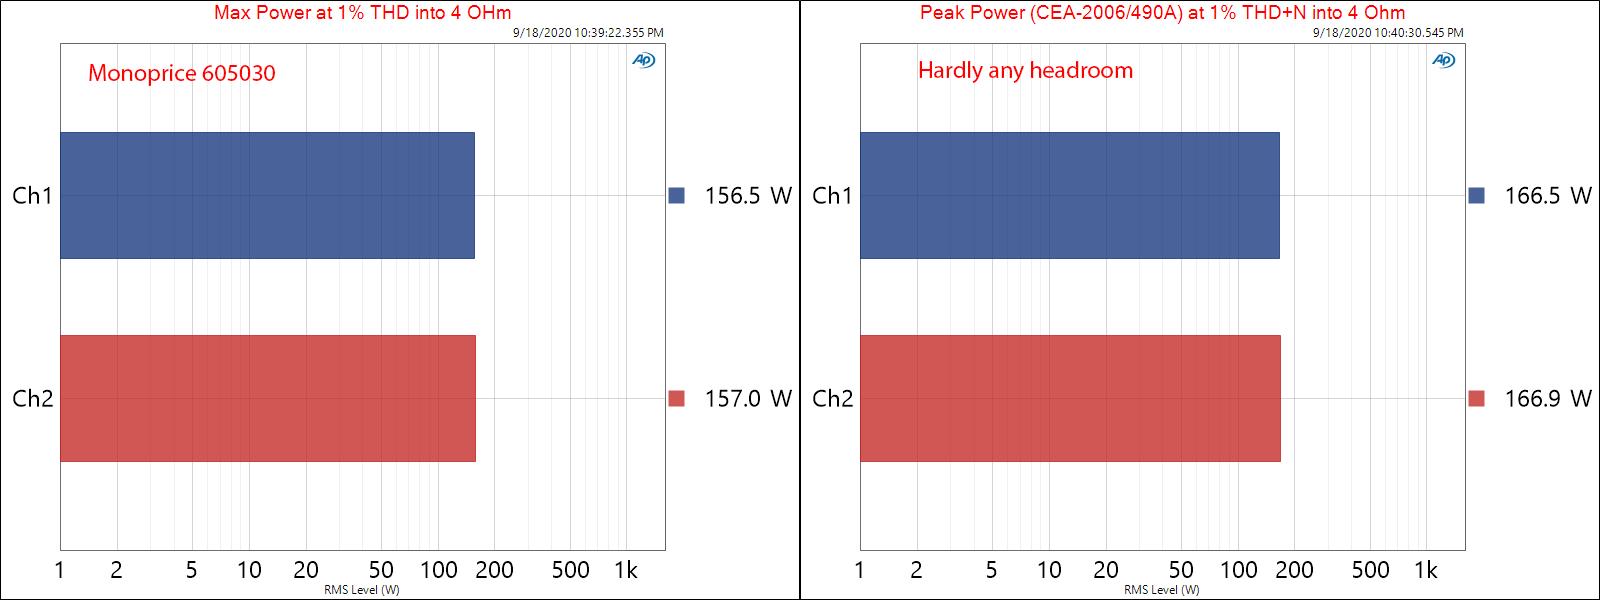 Monoprice 605030 pro amplifier Max and Peak Power audio measurements.png